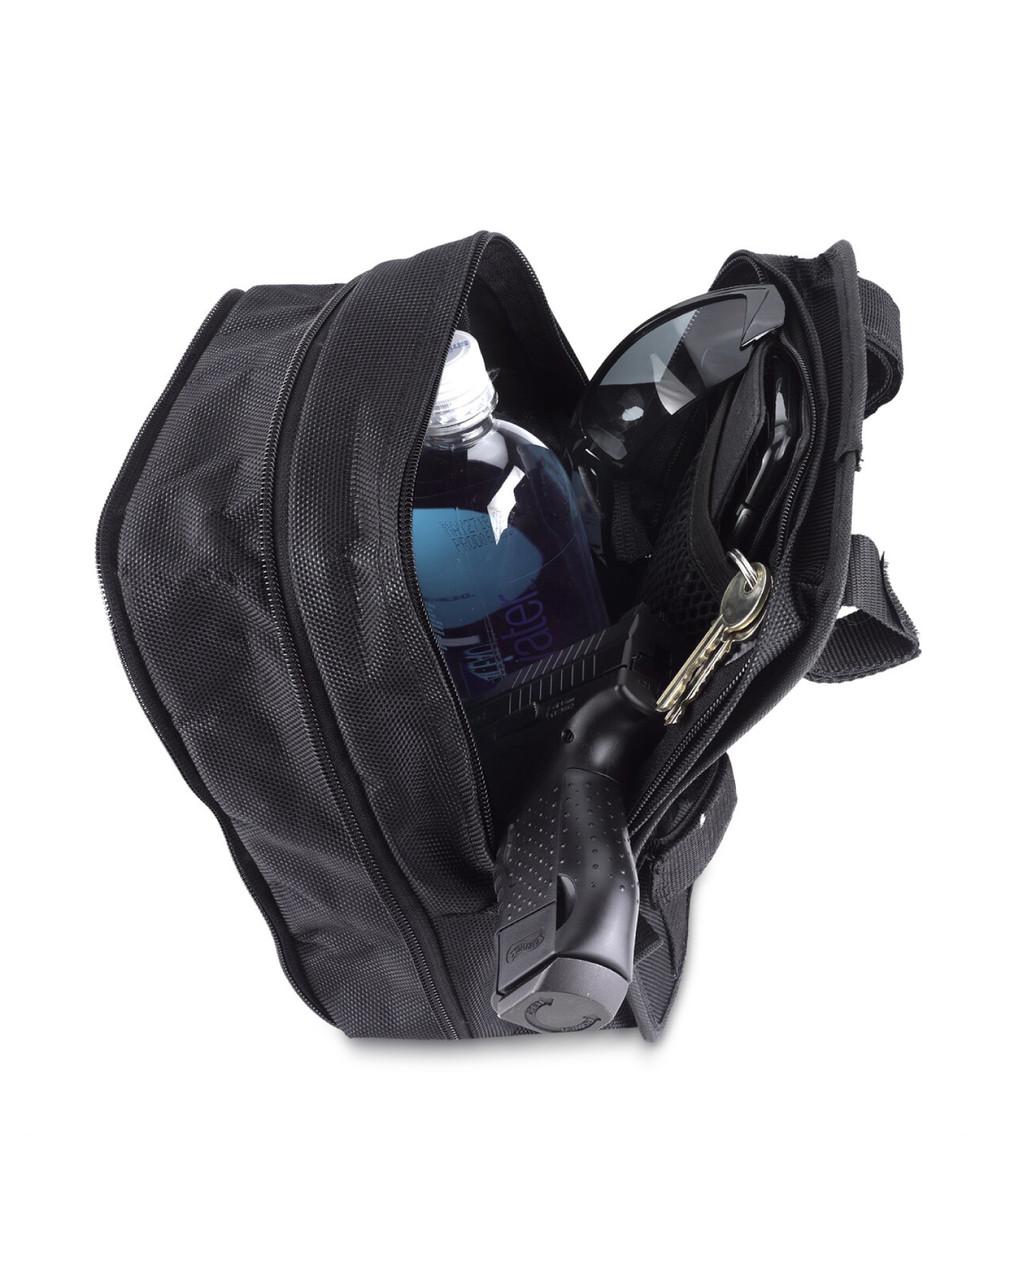 Viking Tall T-Bar Bag For Harley Davidson Carrying Items View